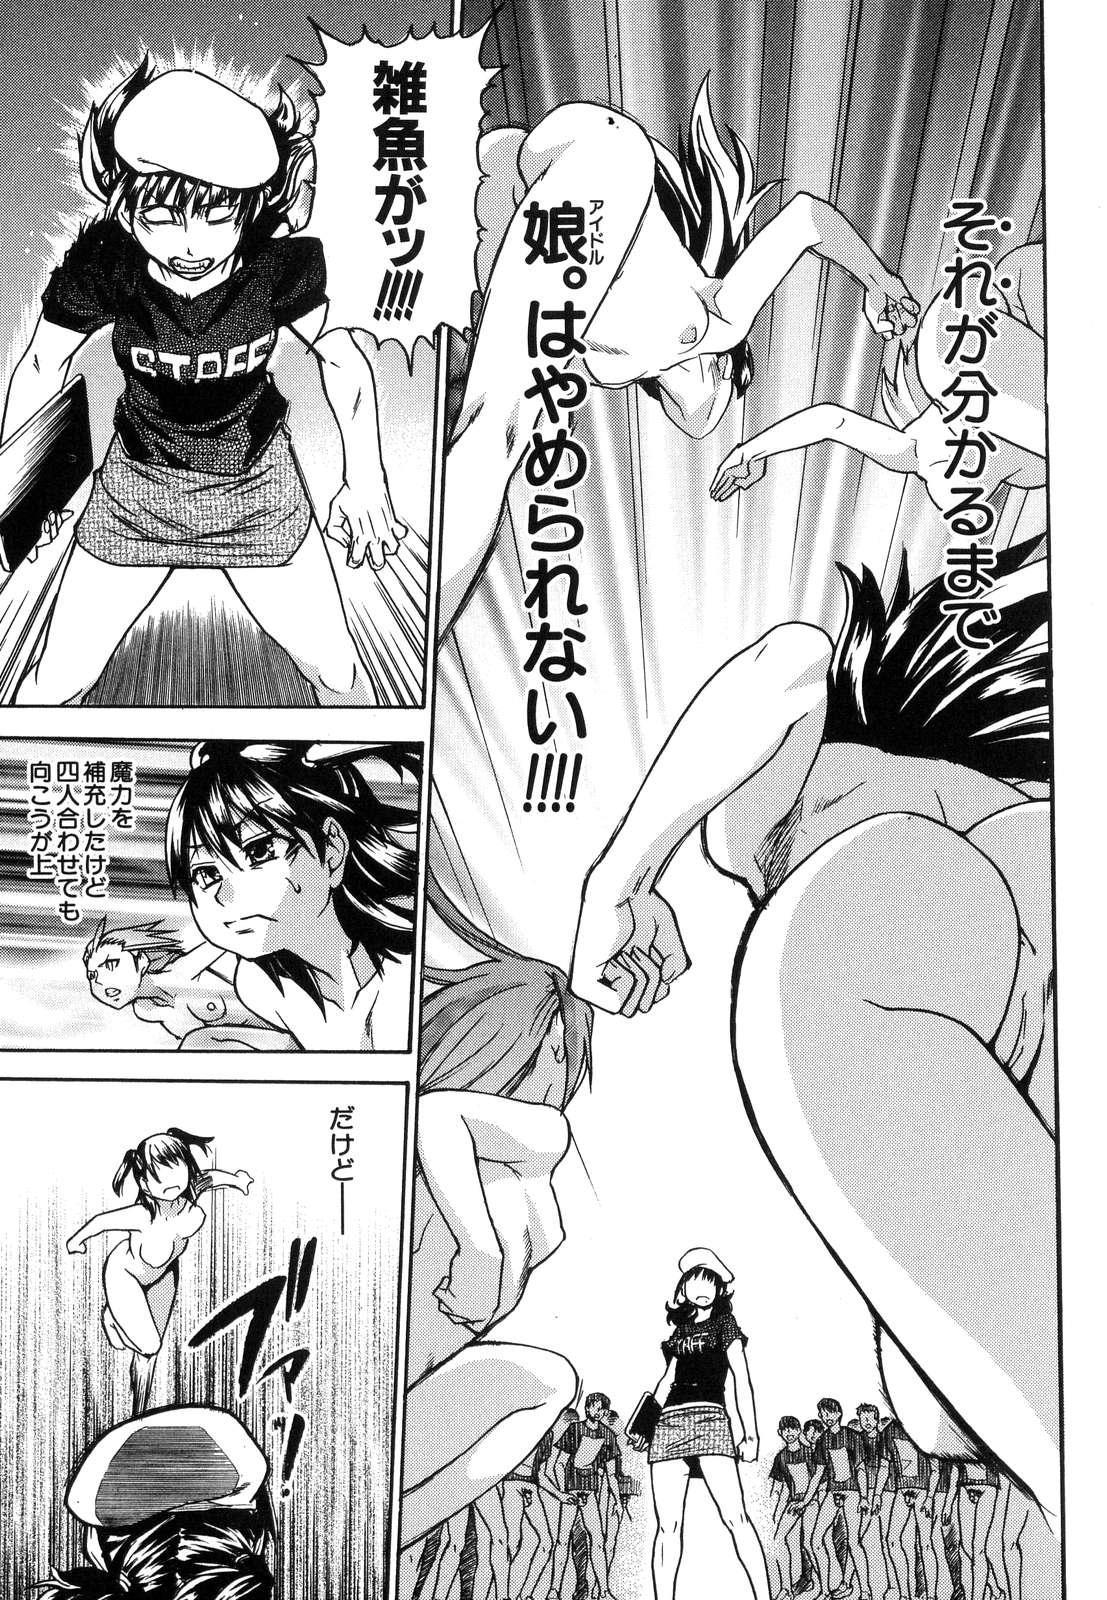 Shining Musume. 6. Rainbow Six 158